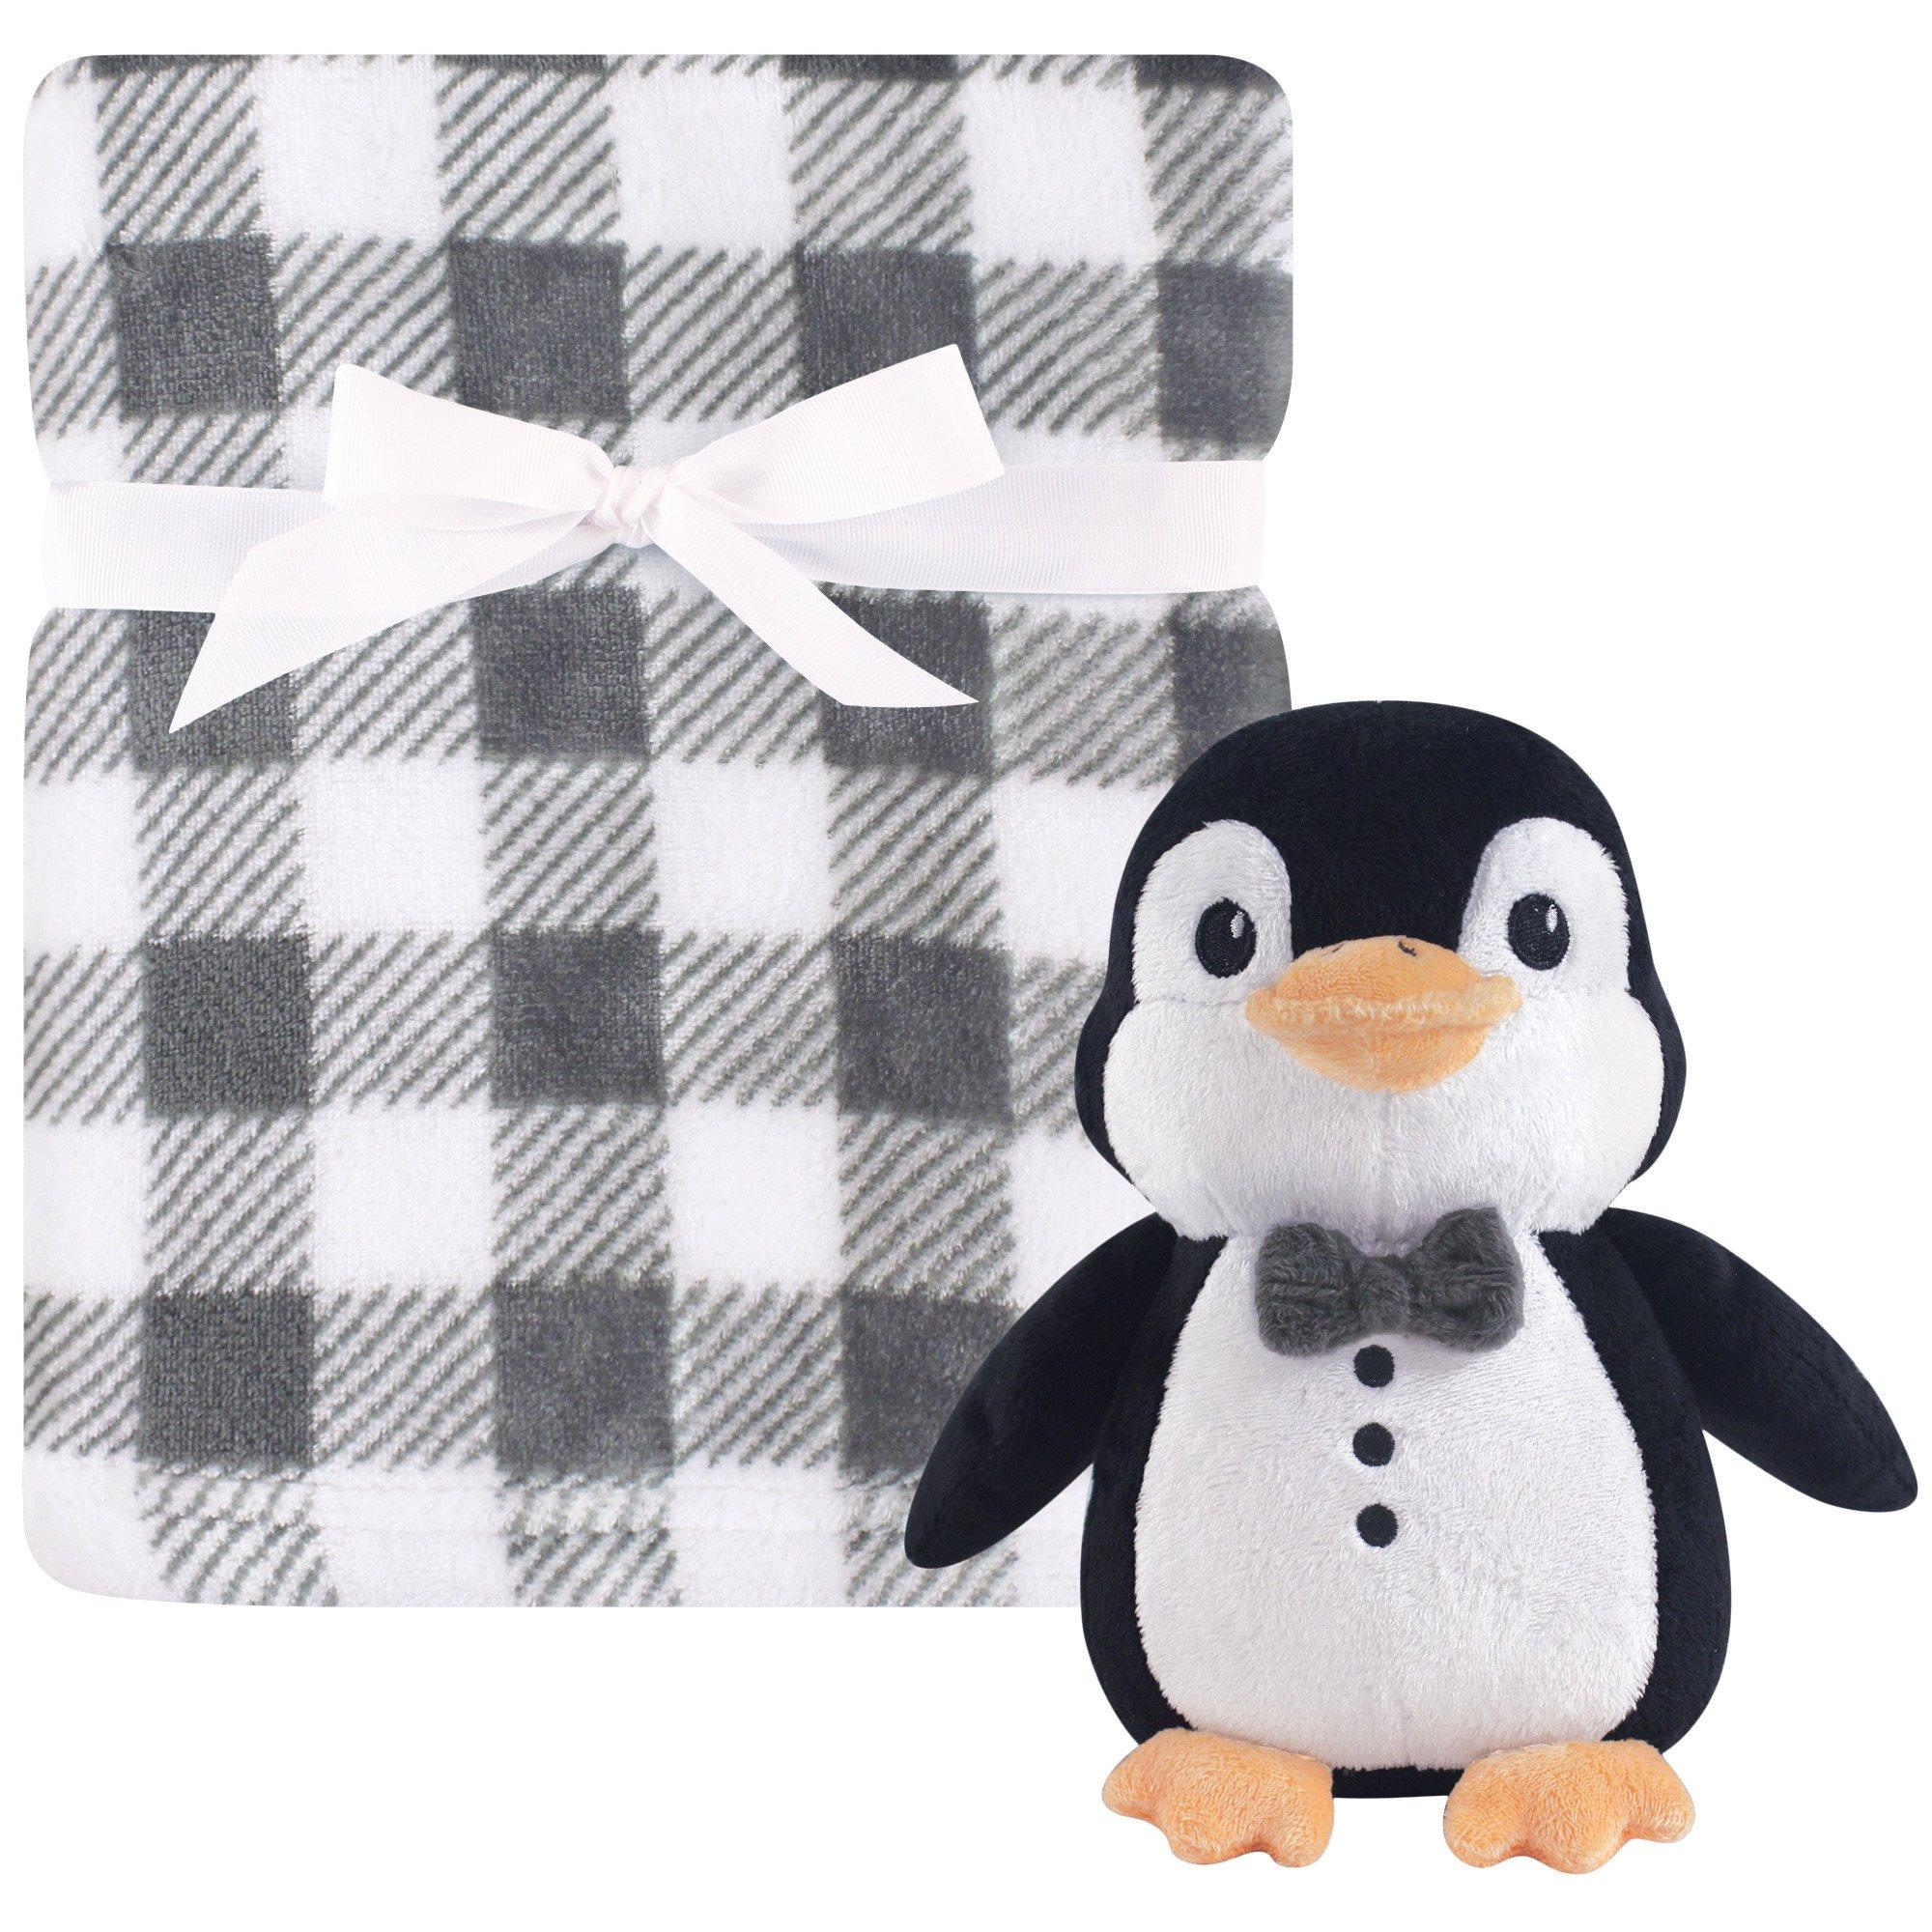 Hudson Baby Blanket with Plush Toy Set, Mr. Penguin, One Size